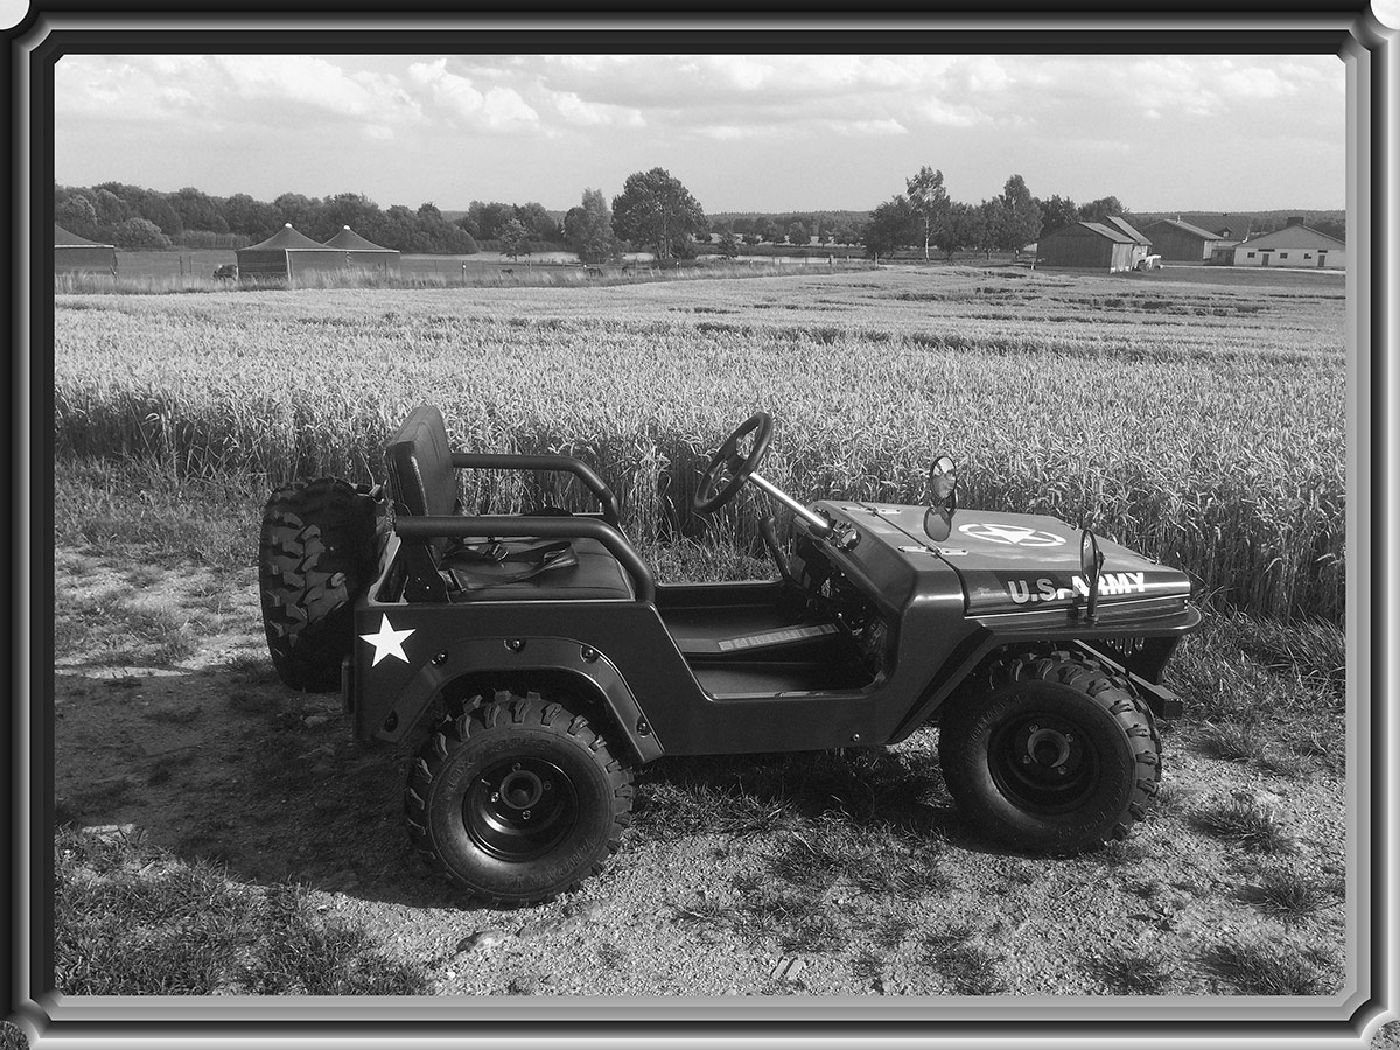 hillbil u s army willys mini jeep mini car for. Black Bedroom Furniture Sets. Home Design Ideas